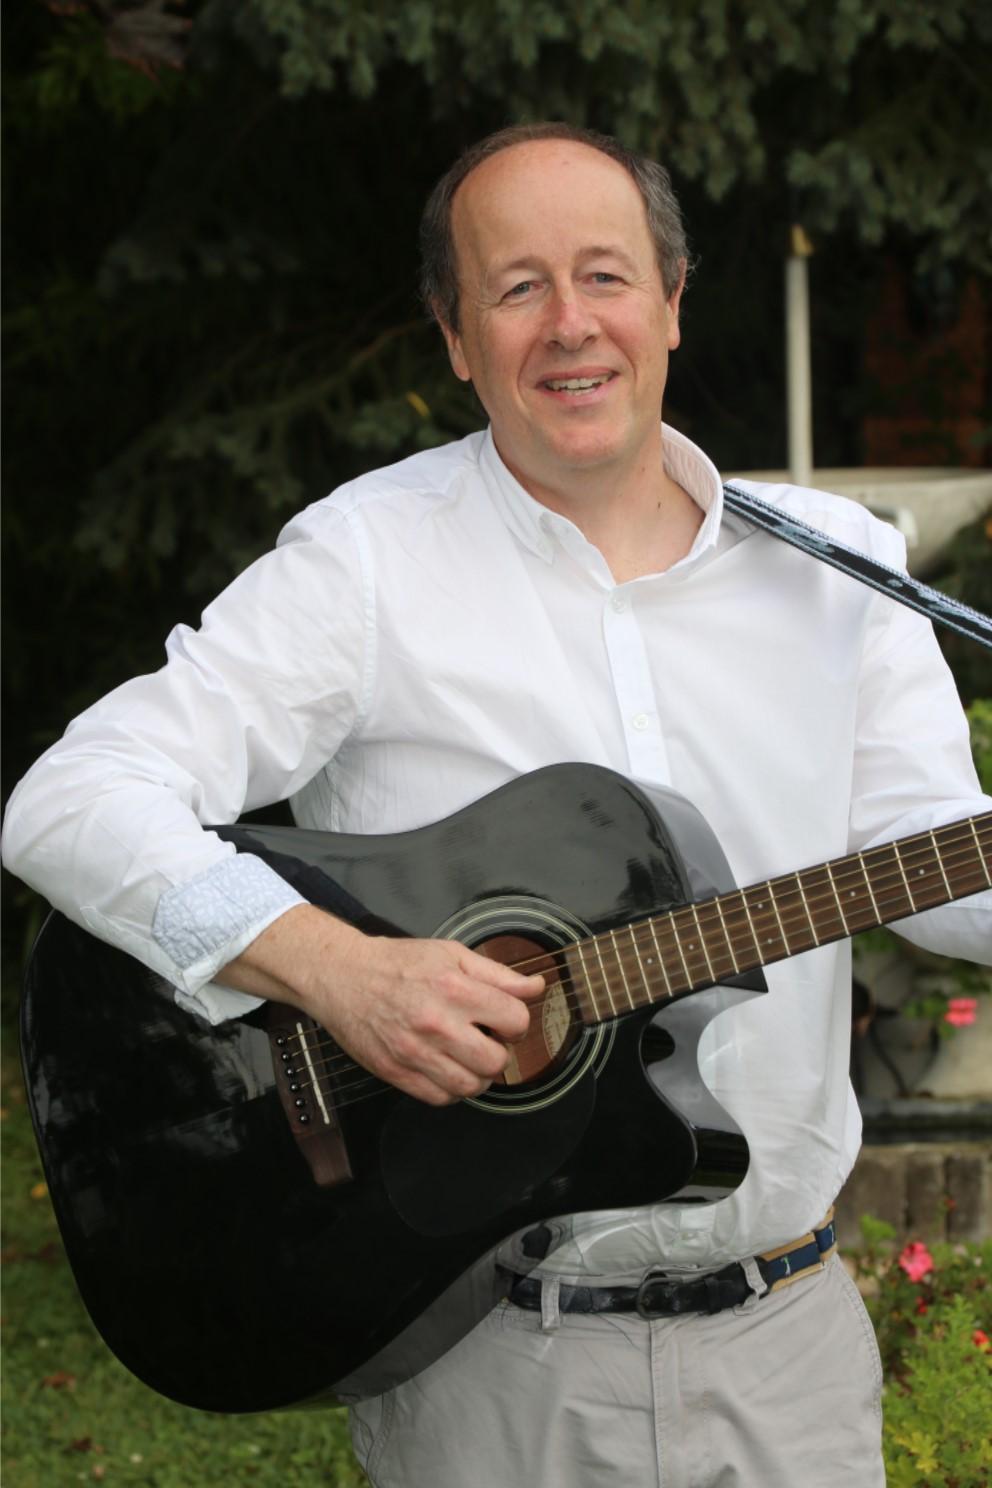 Thierry Leclerc